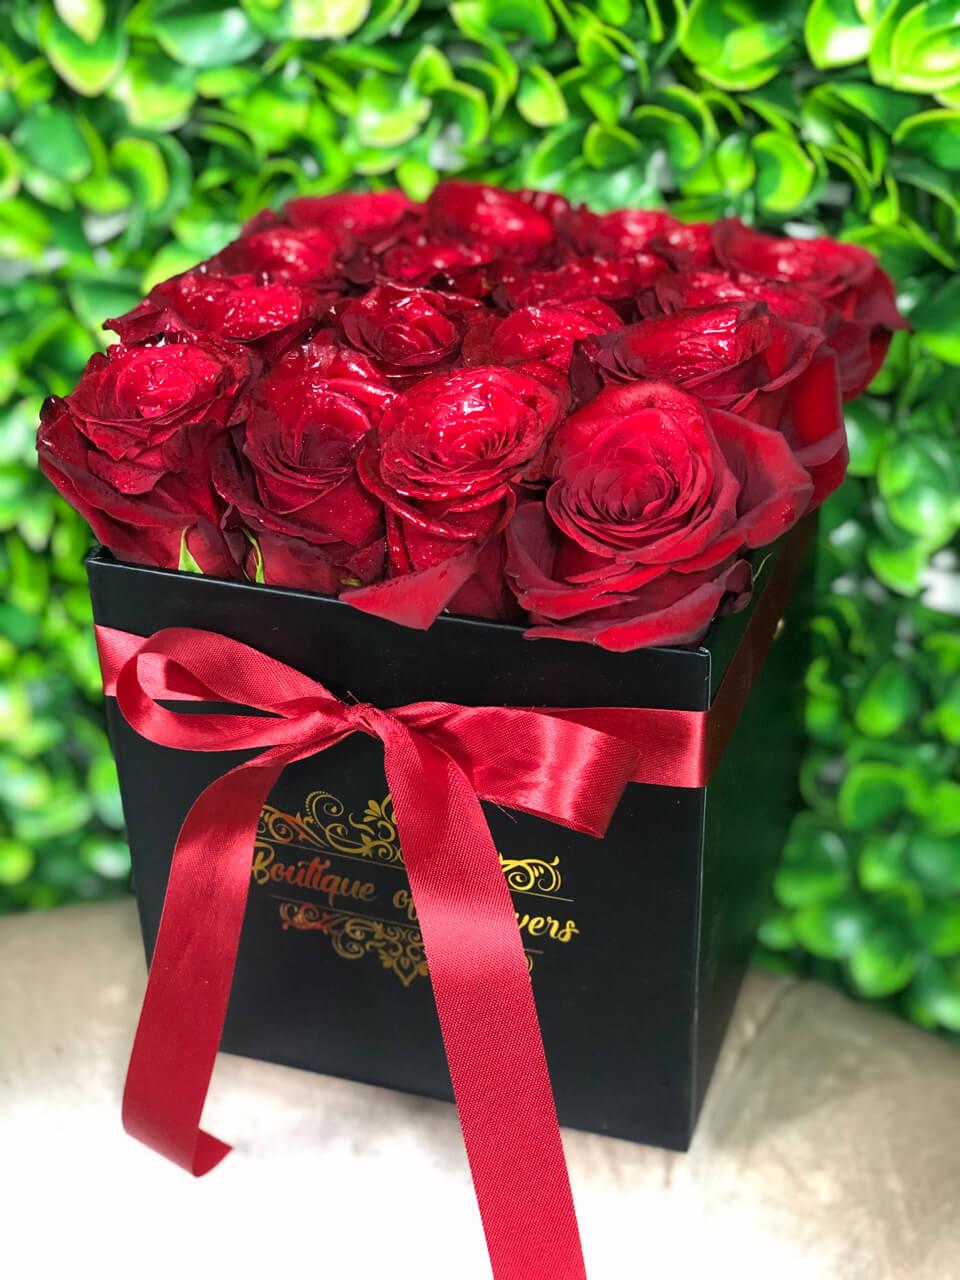 Red rose small black square box